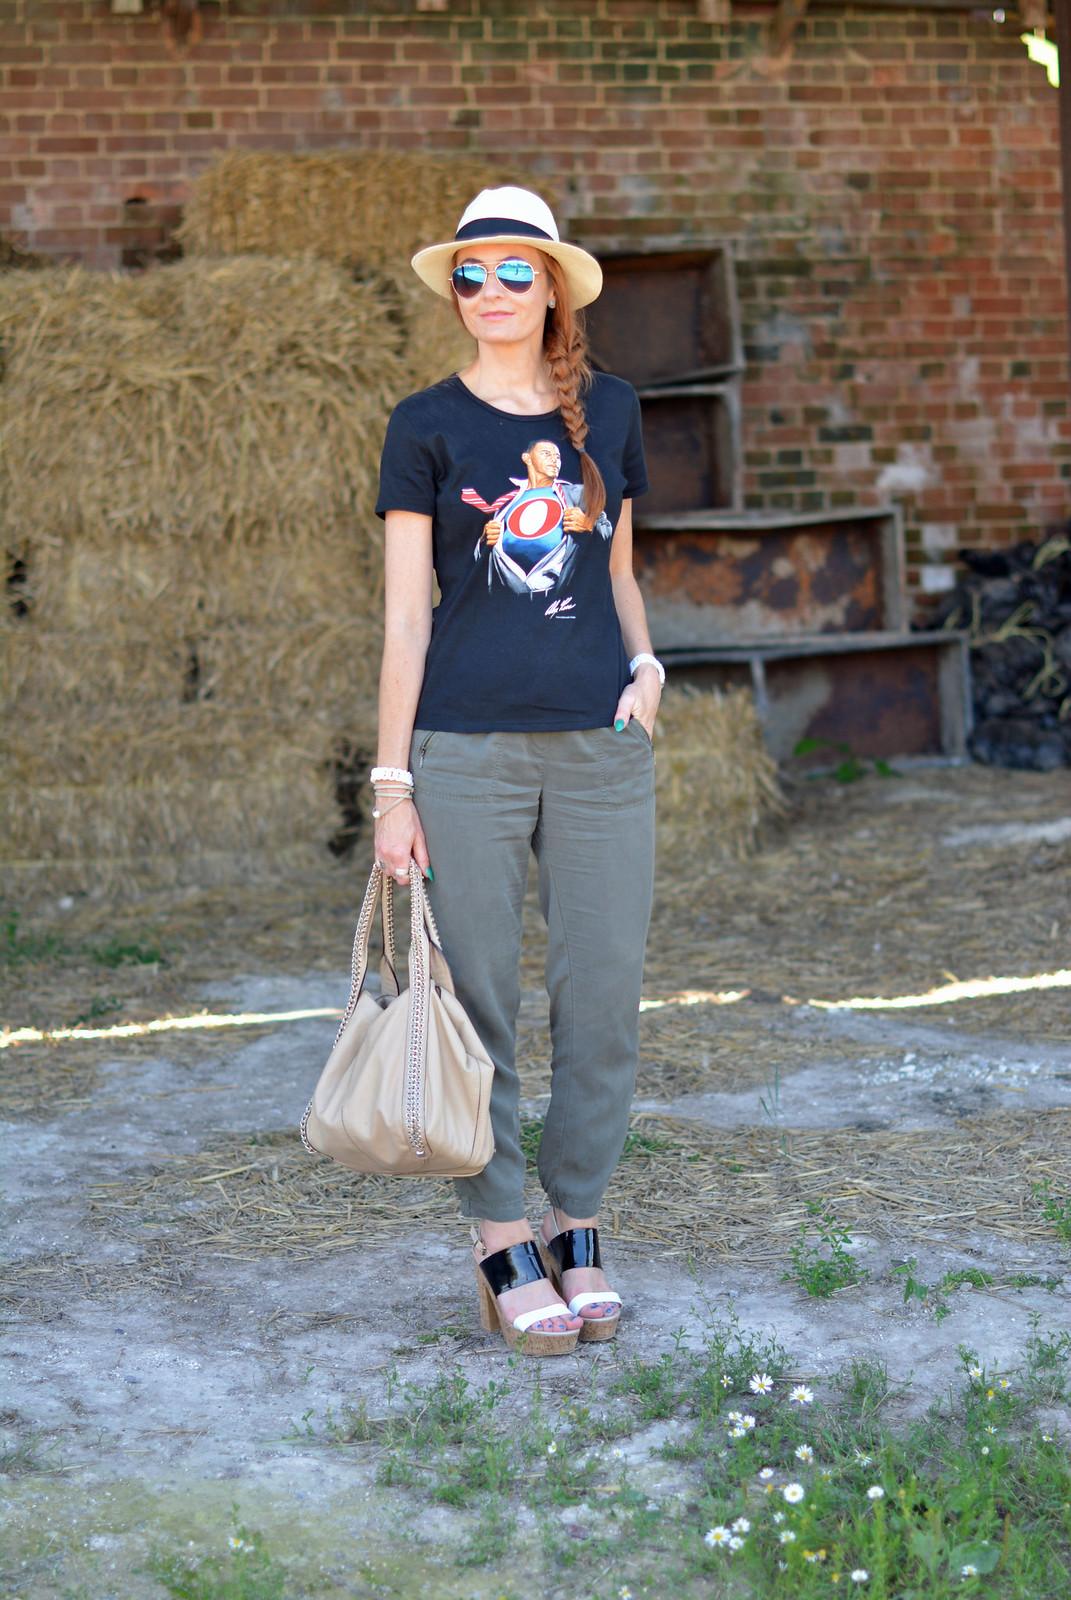 Black graphic tee with Panama hat, khaki track pants, strappy platforms